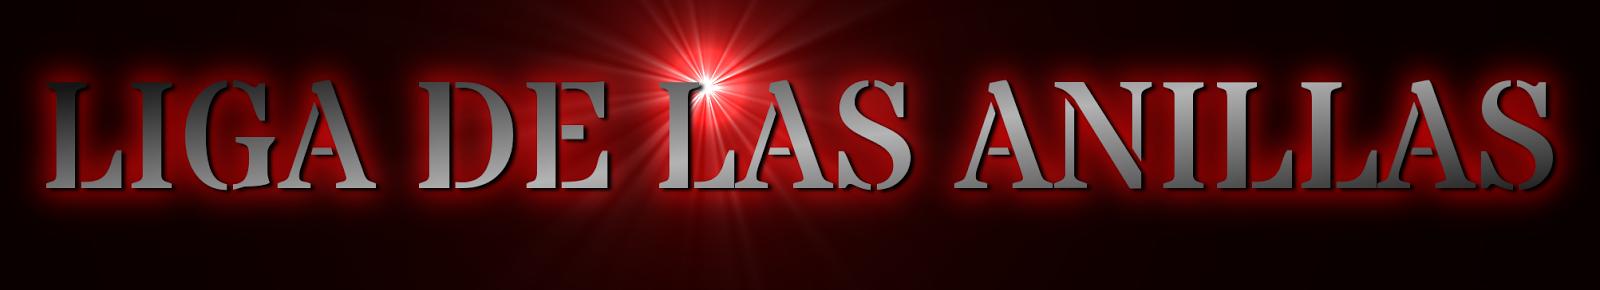 LIGA DE LAS ANILLAS